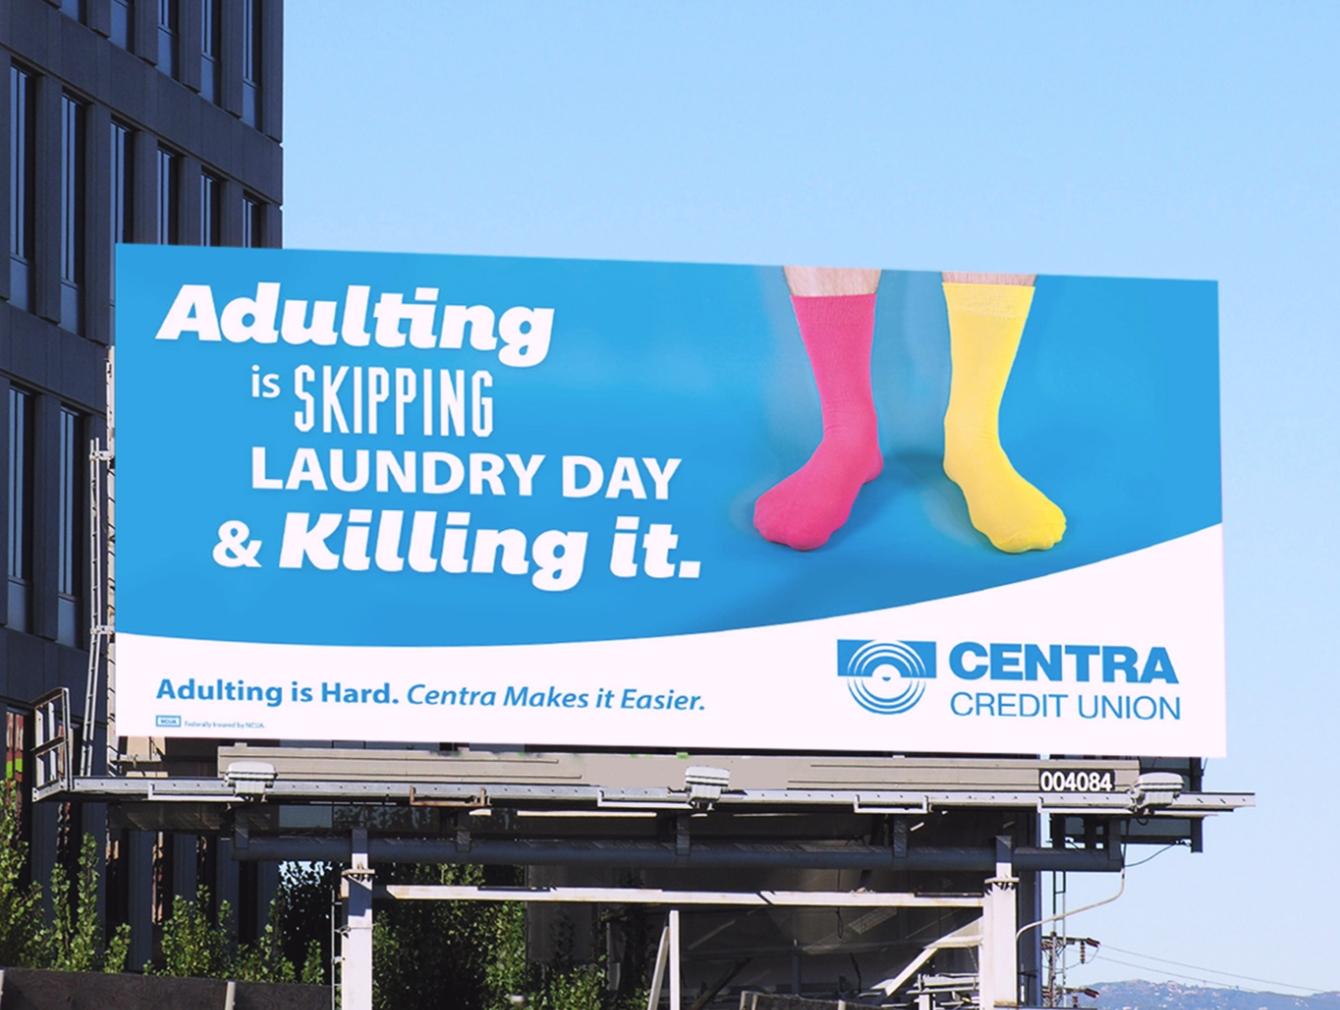 Centra Credit Union billboard near building featuring socks.